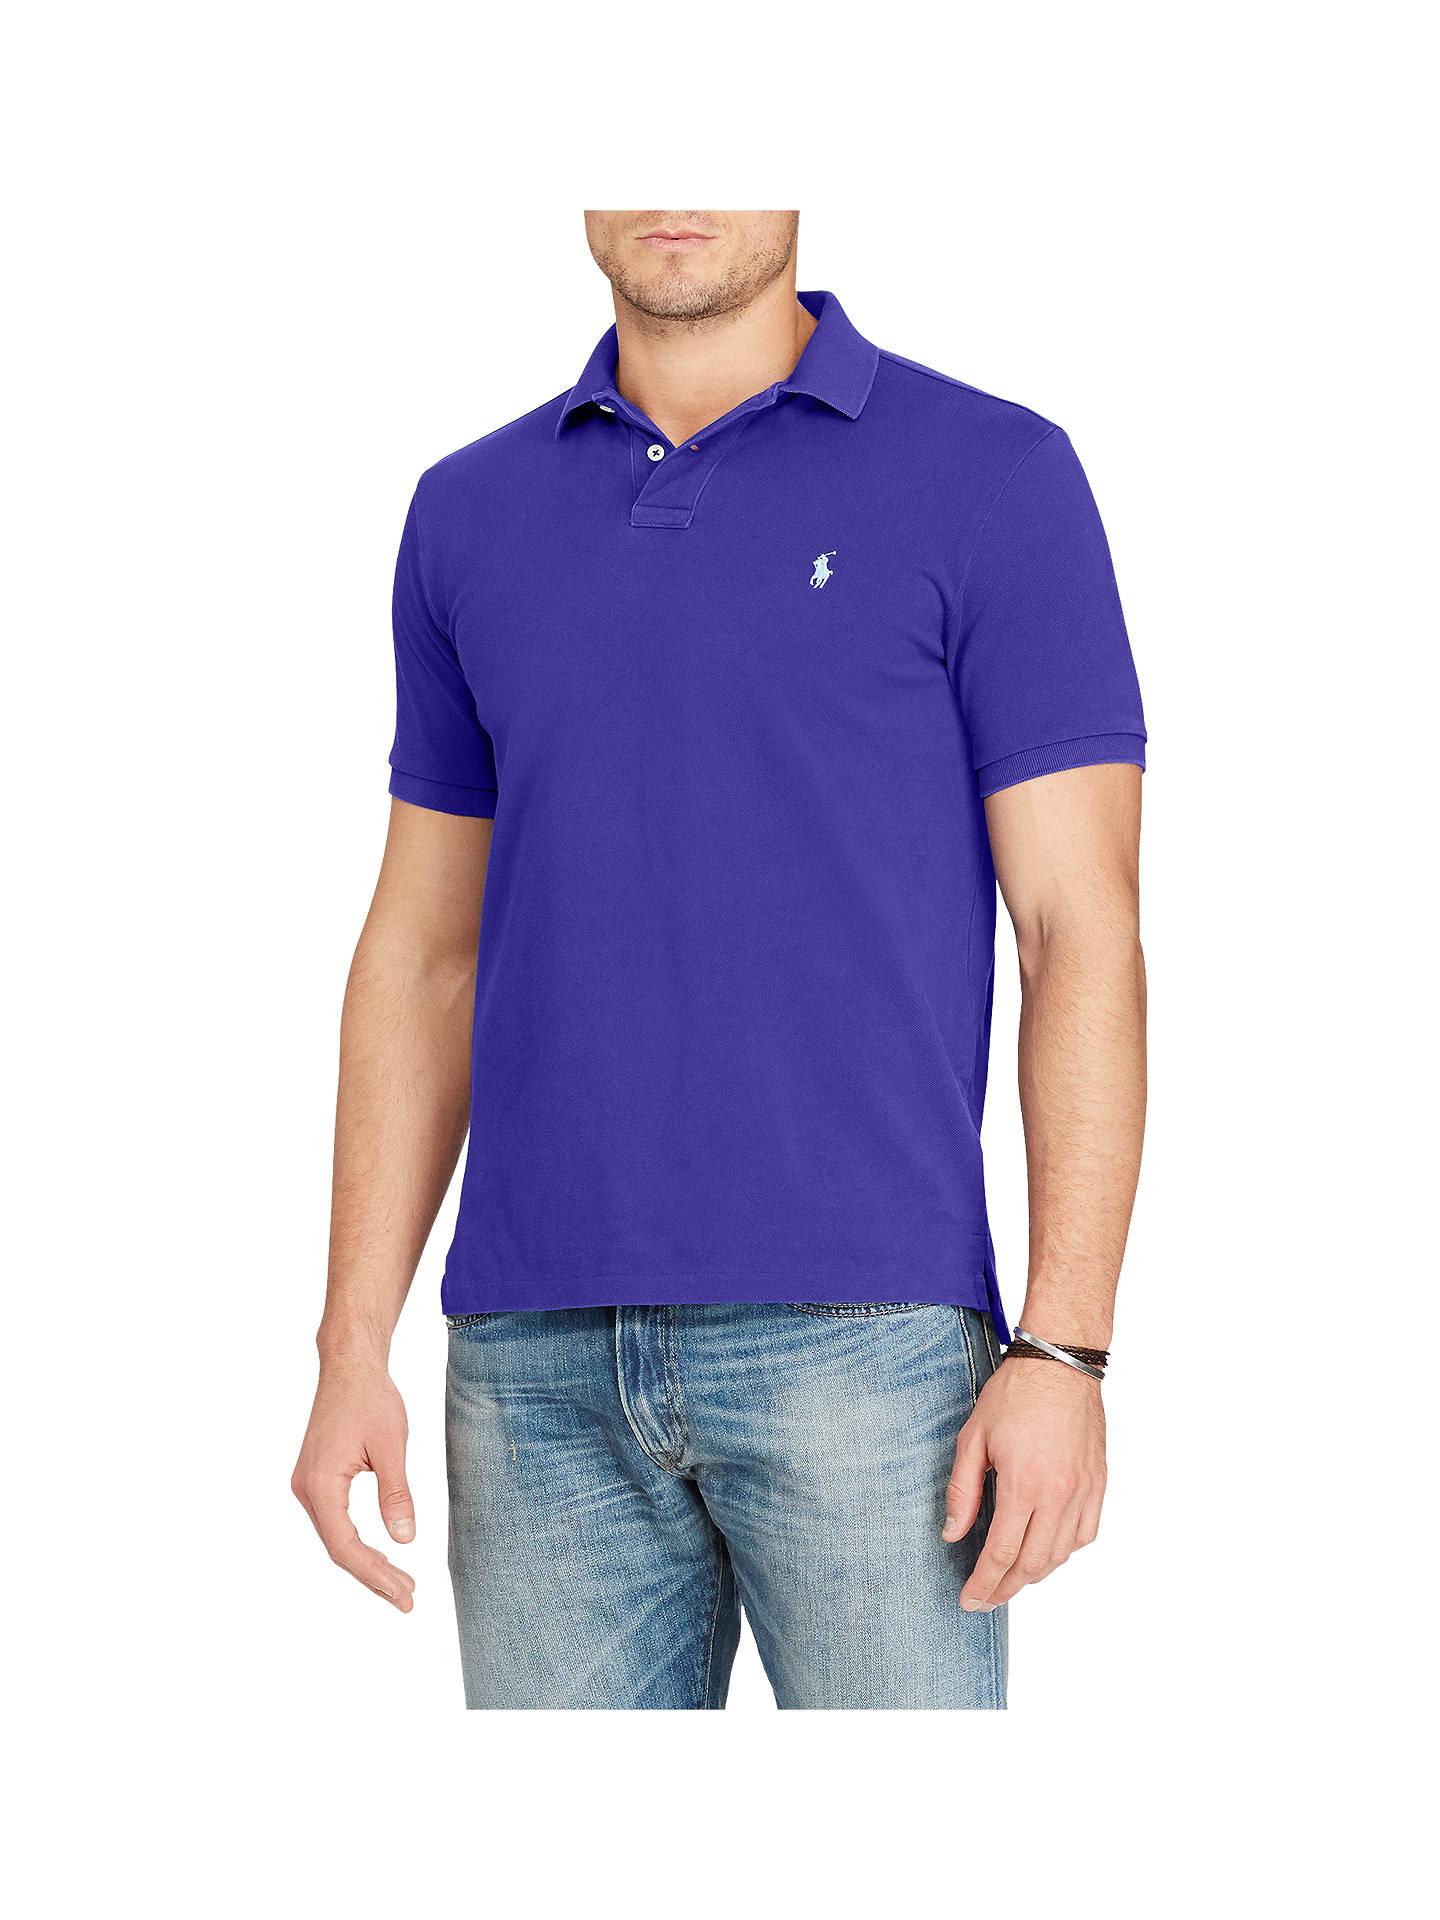 ff3f054b Buy Polo Ralph Lauren Slim Fit Short Sleeve Polo Shirt, Foster Blue, M  Online ...